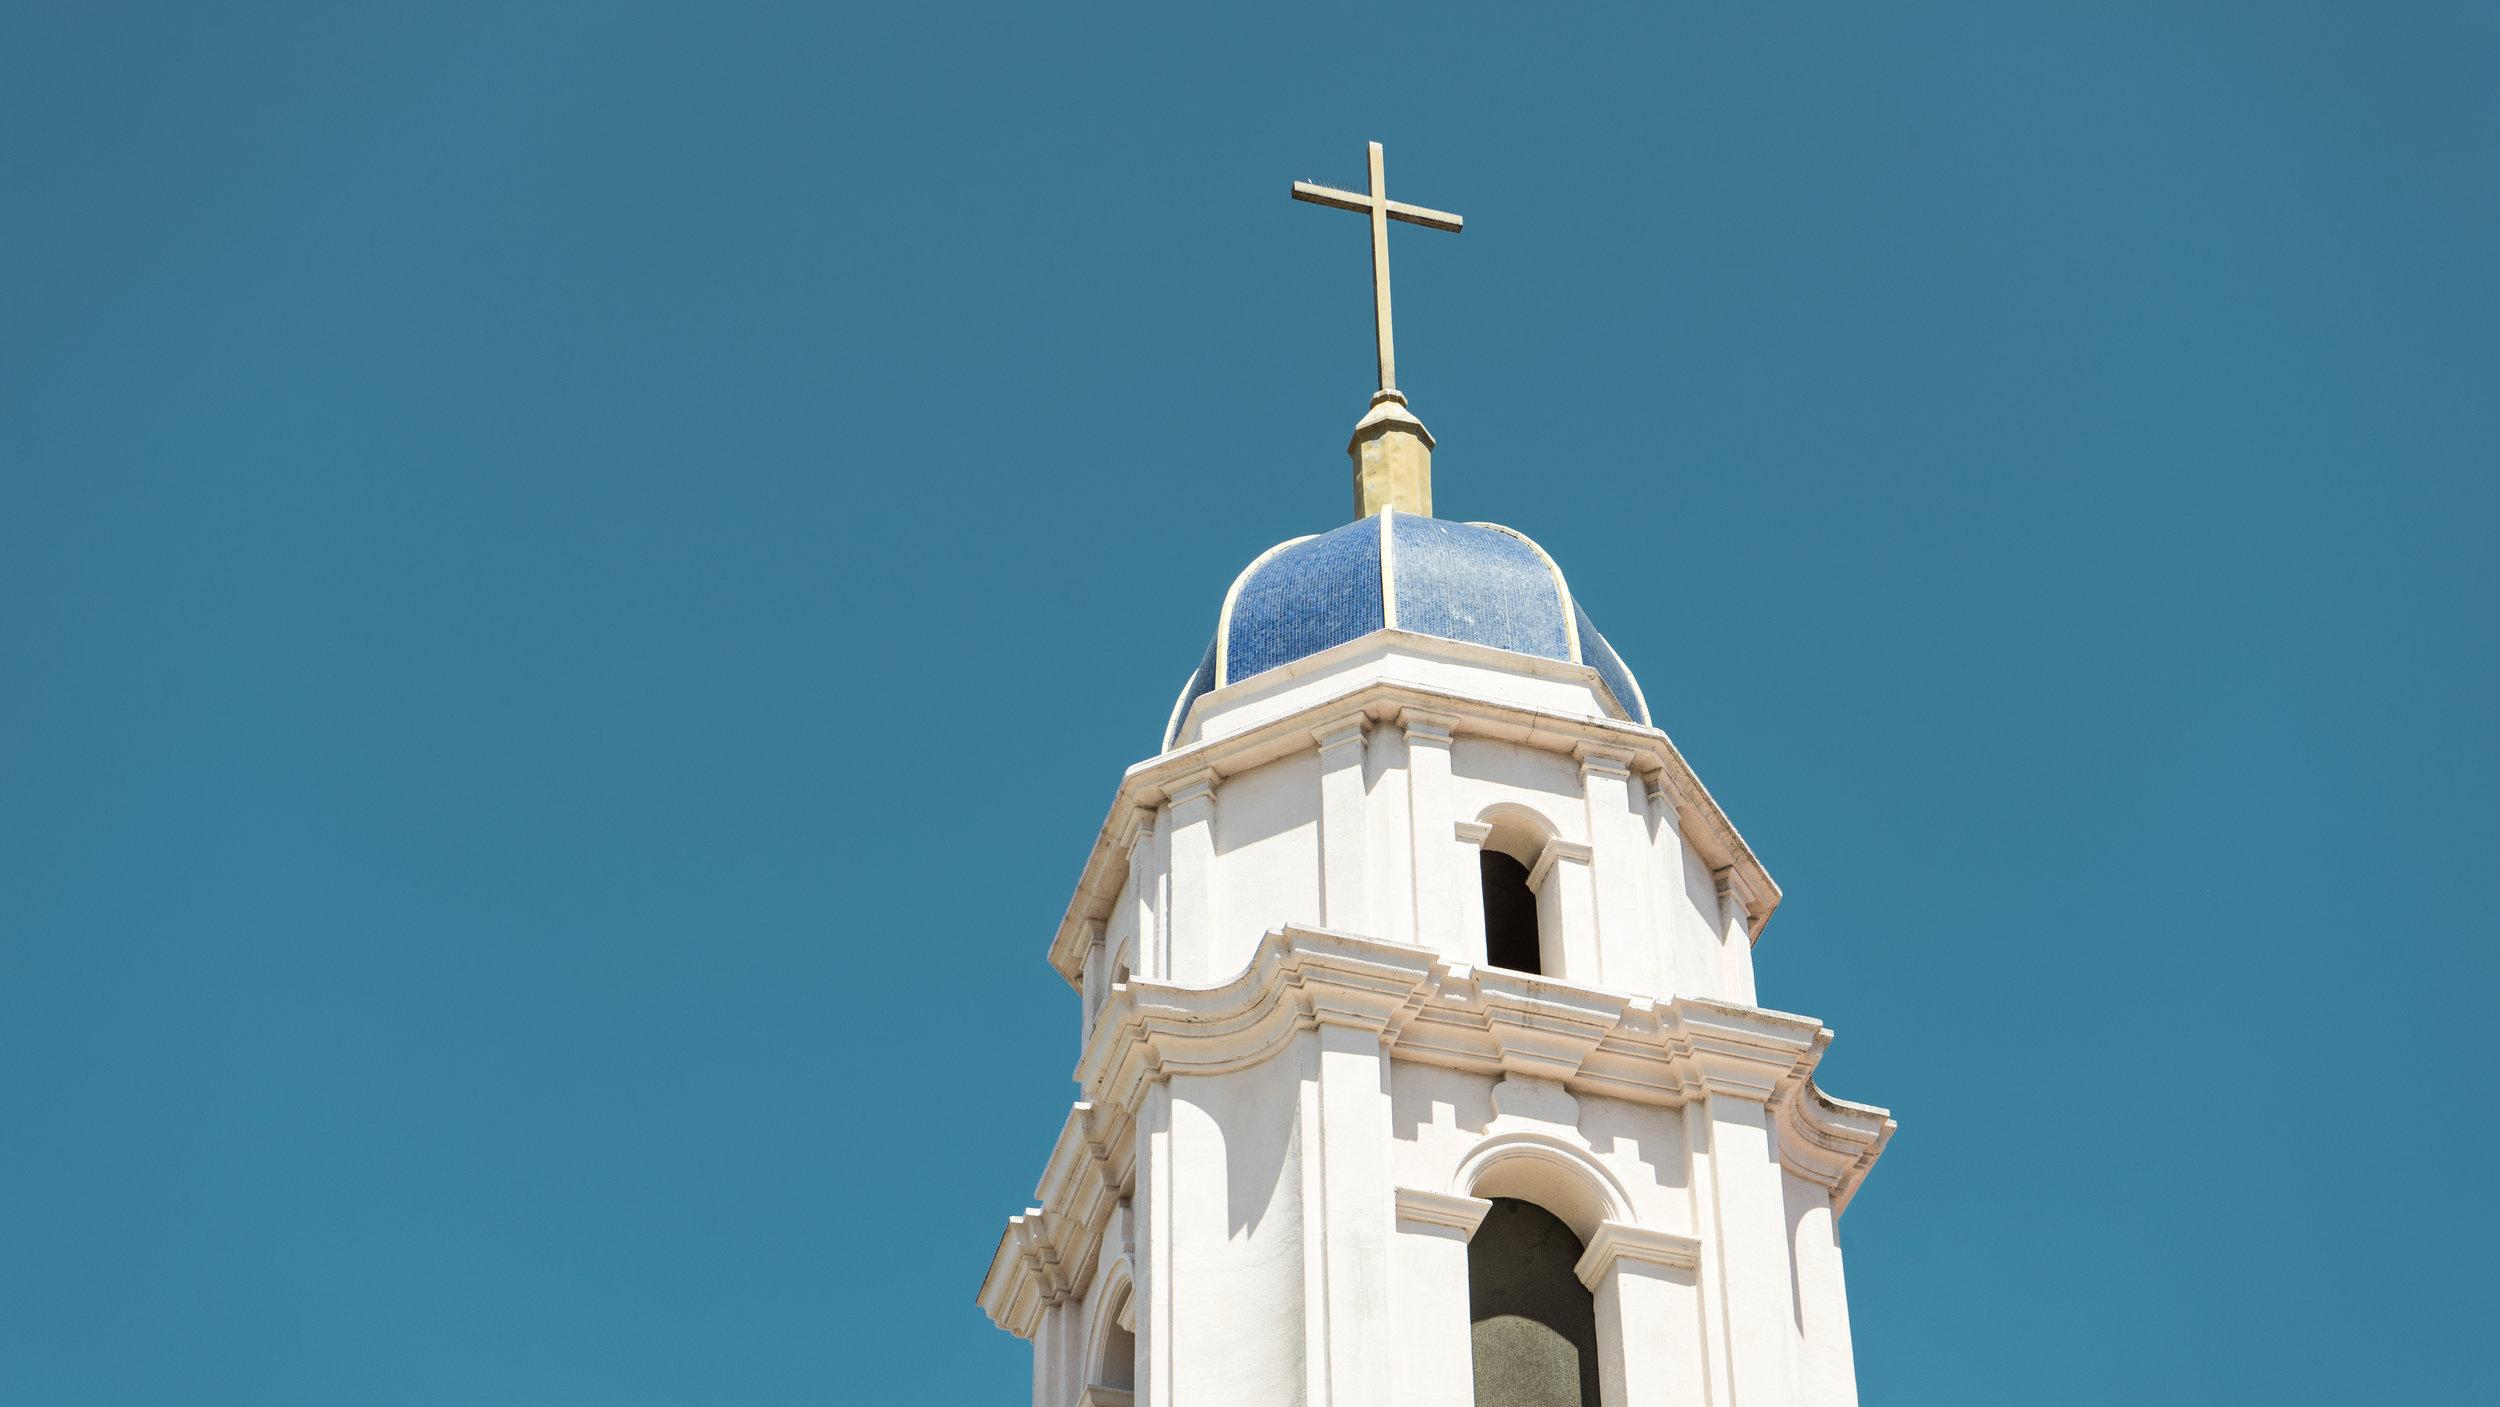 K.D. Stahl Construction Group Inc. - Saint Therese Parish Restoration Construction Project